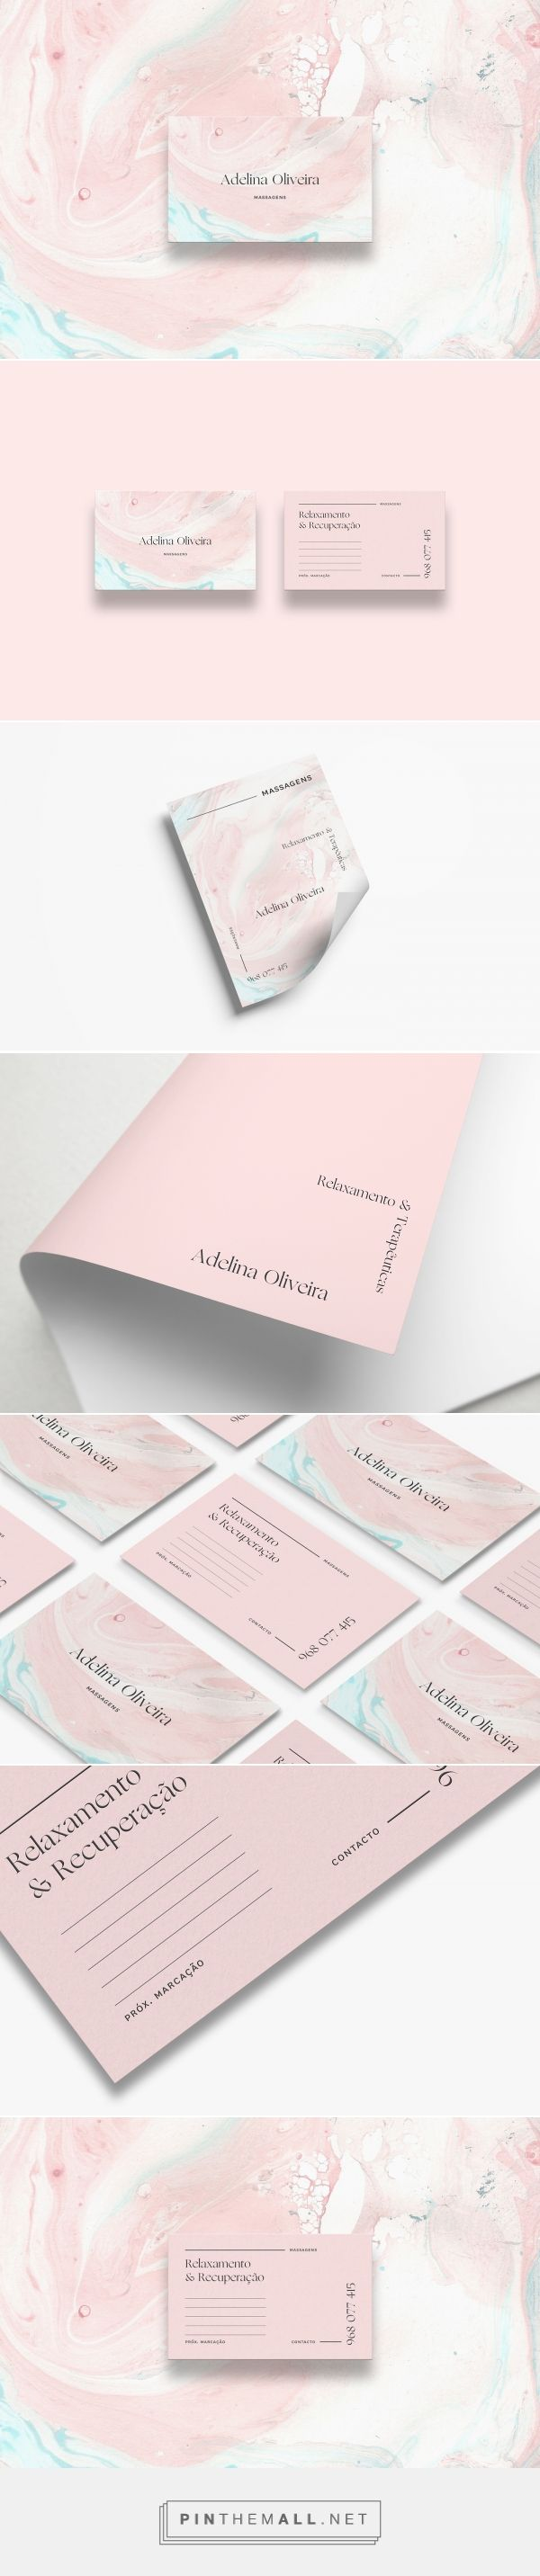 Adelina Oliveira Massage Therapist Branding by Nock Design   Fivestar Branding Agency – Design and Branding Agency & Inspiration Gallery